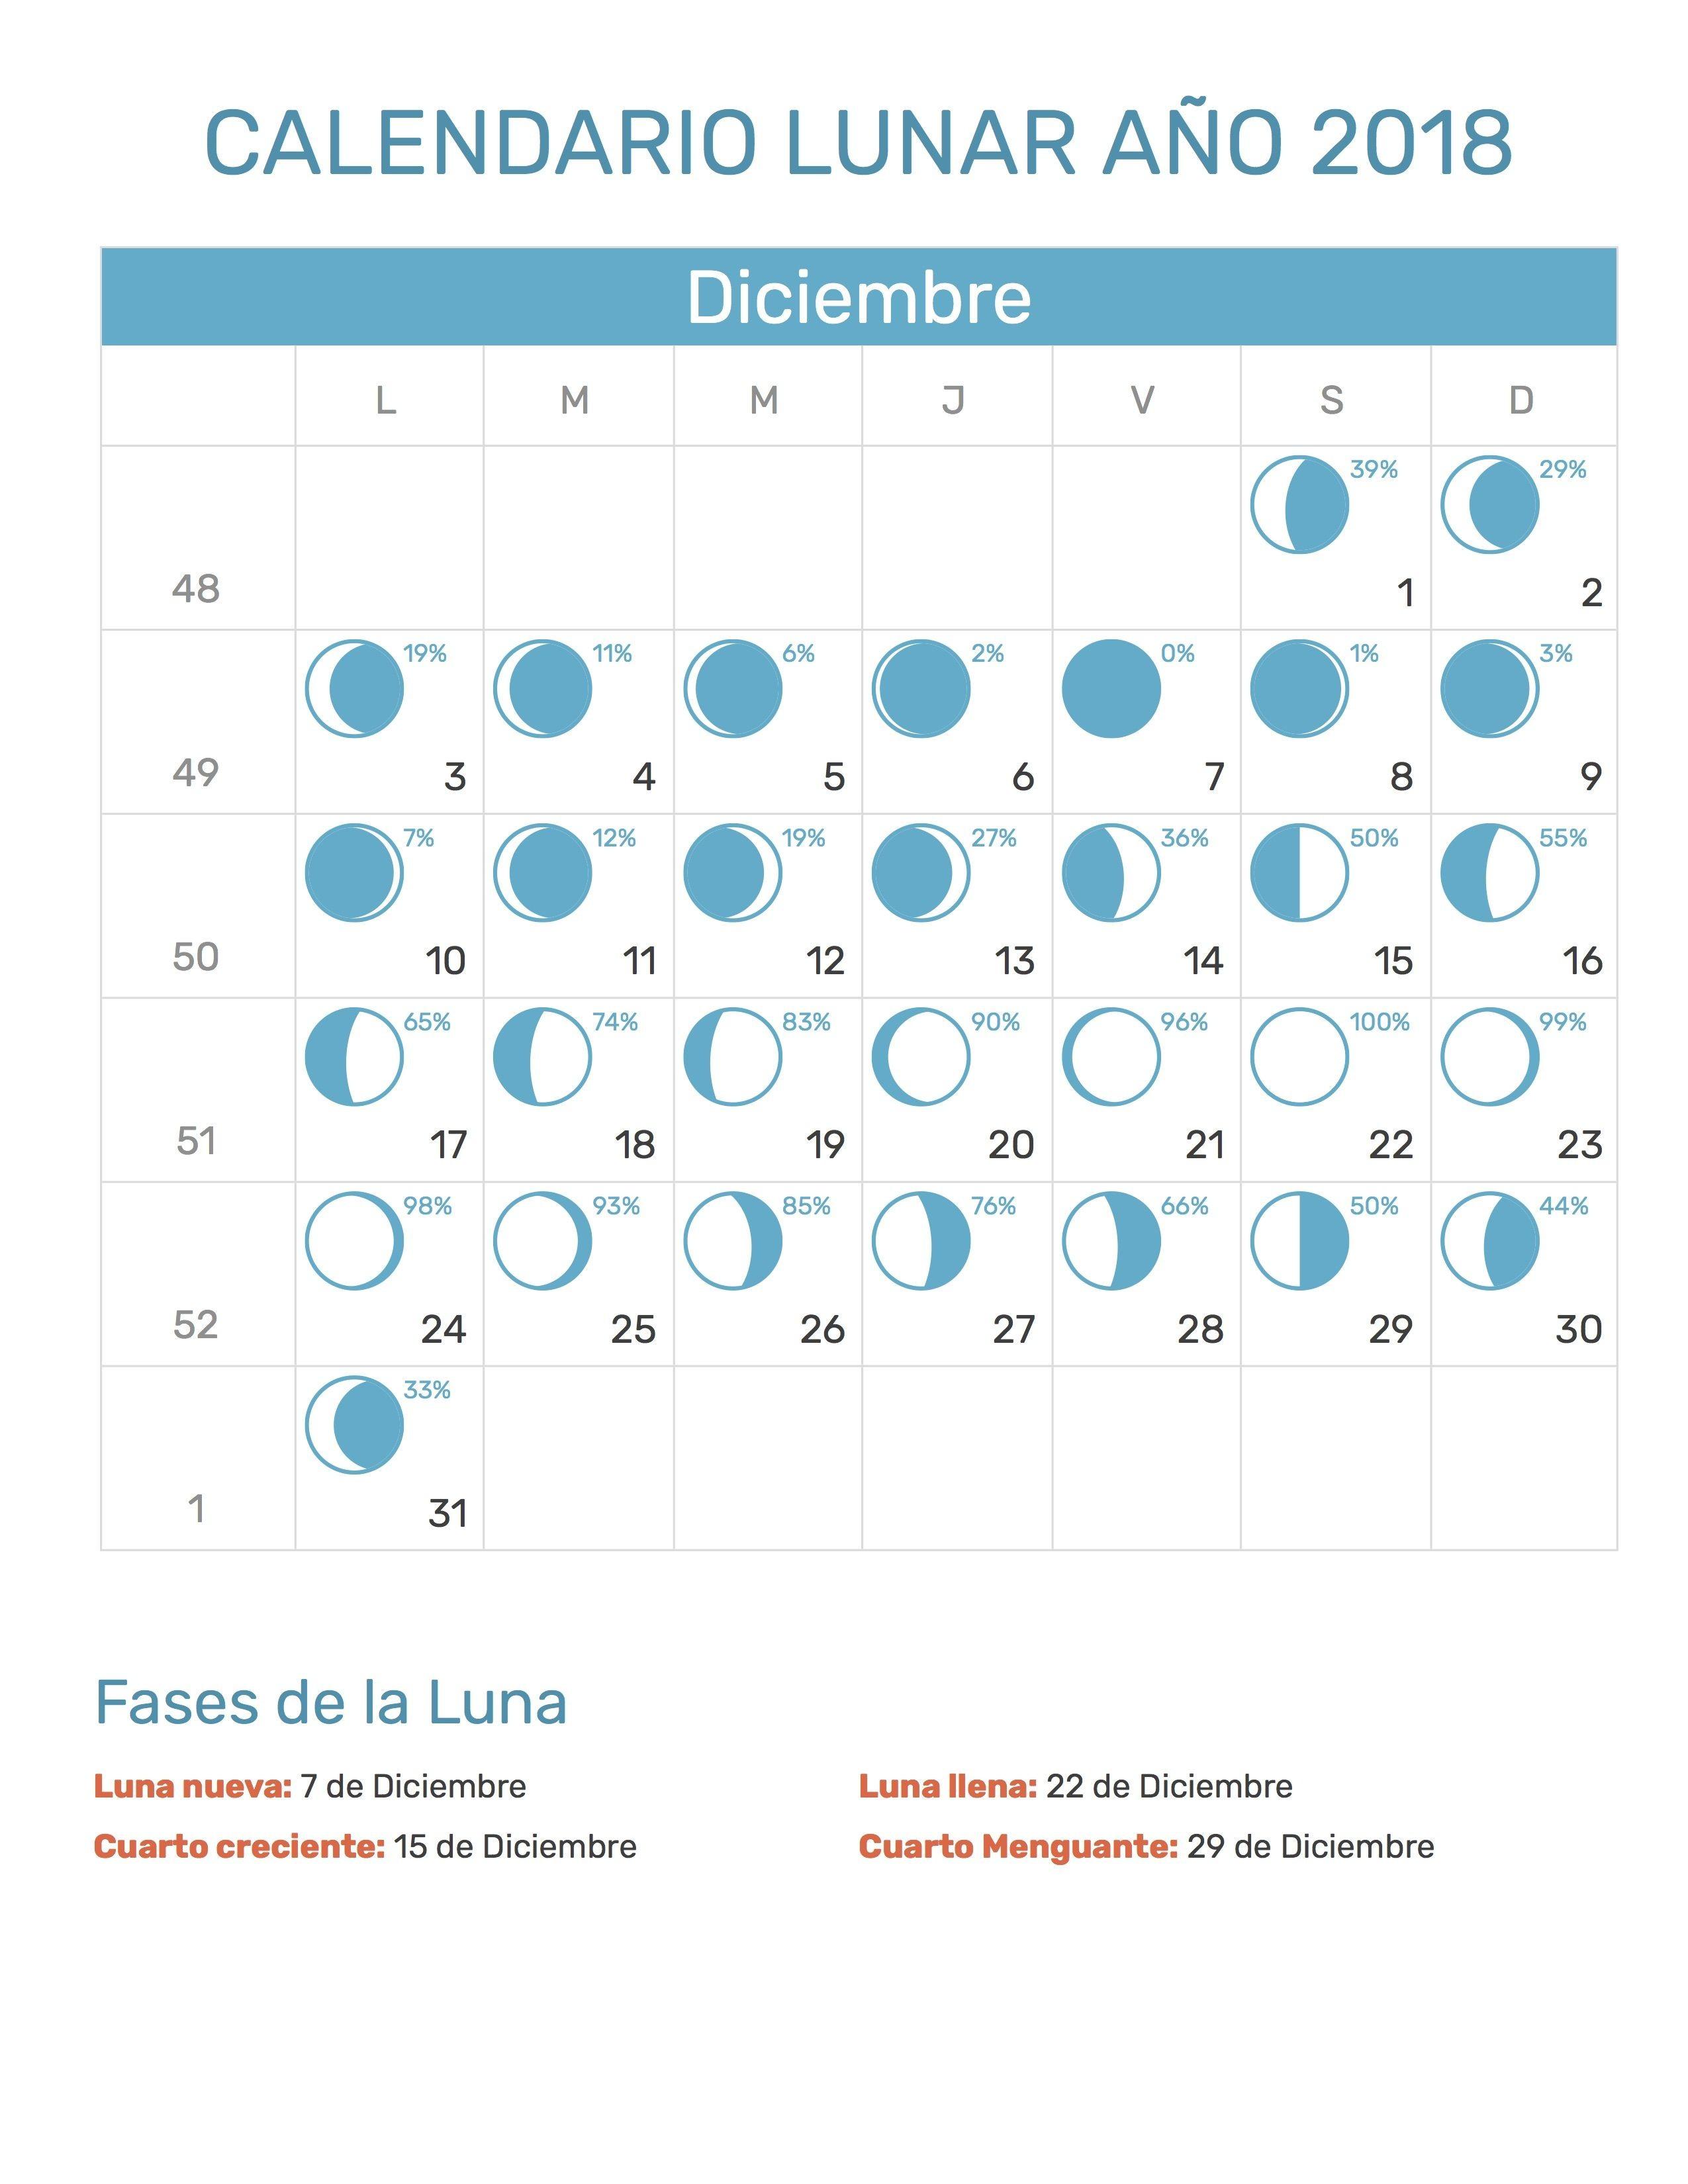 Calendario Noviembre Diciembre Para Imprimir Más Caliente Pin De Calendario Hispano En Calendario Lunar A±o 2018 Of Calendario Noviembre Diciembre Para Imprimir Más Recientes Pack Descargable Planifica Tu A±o 2016 Planificador